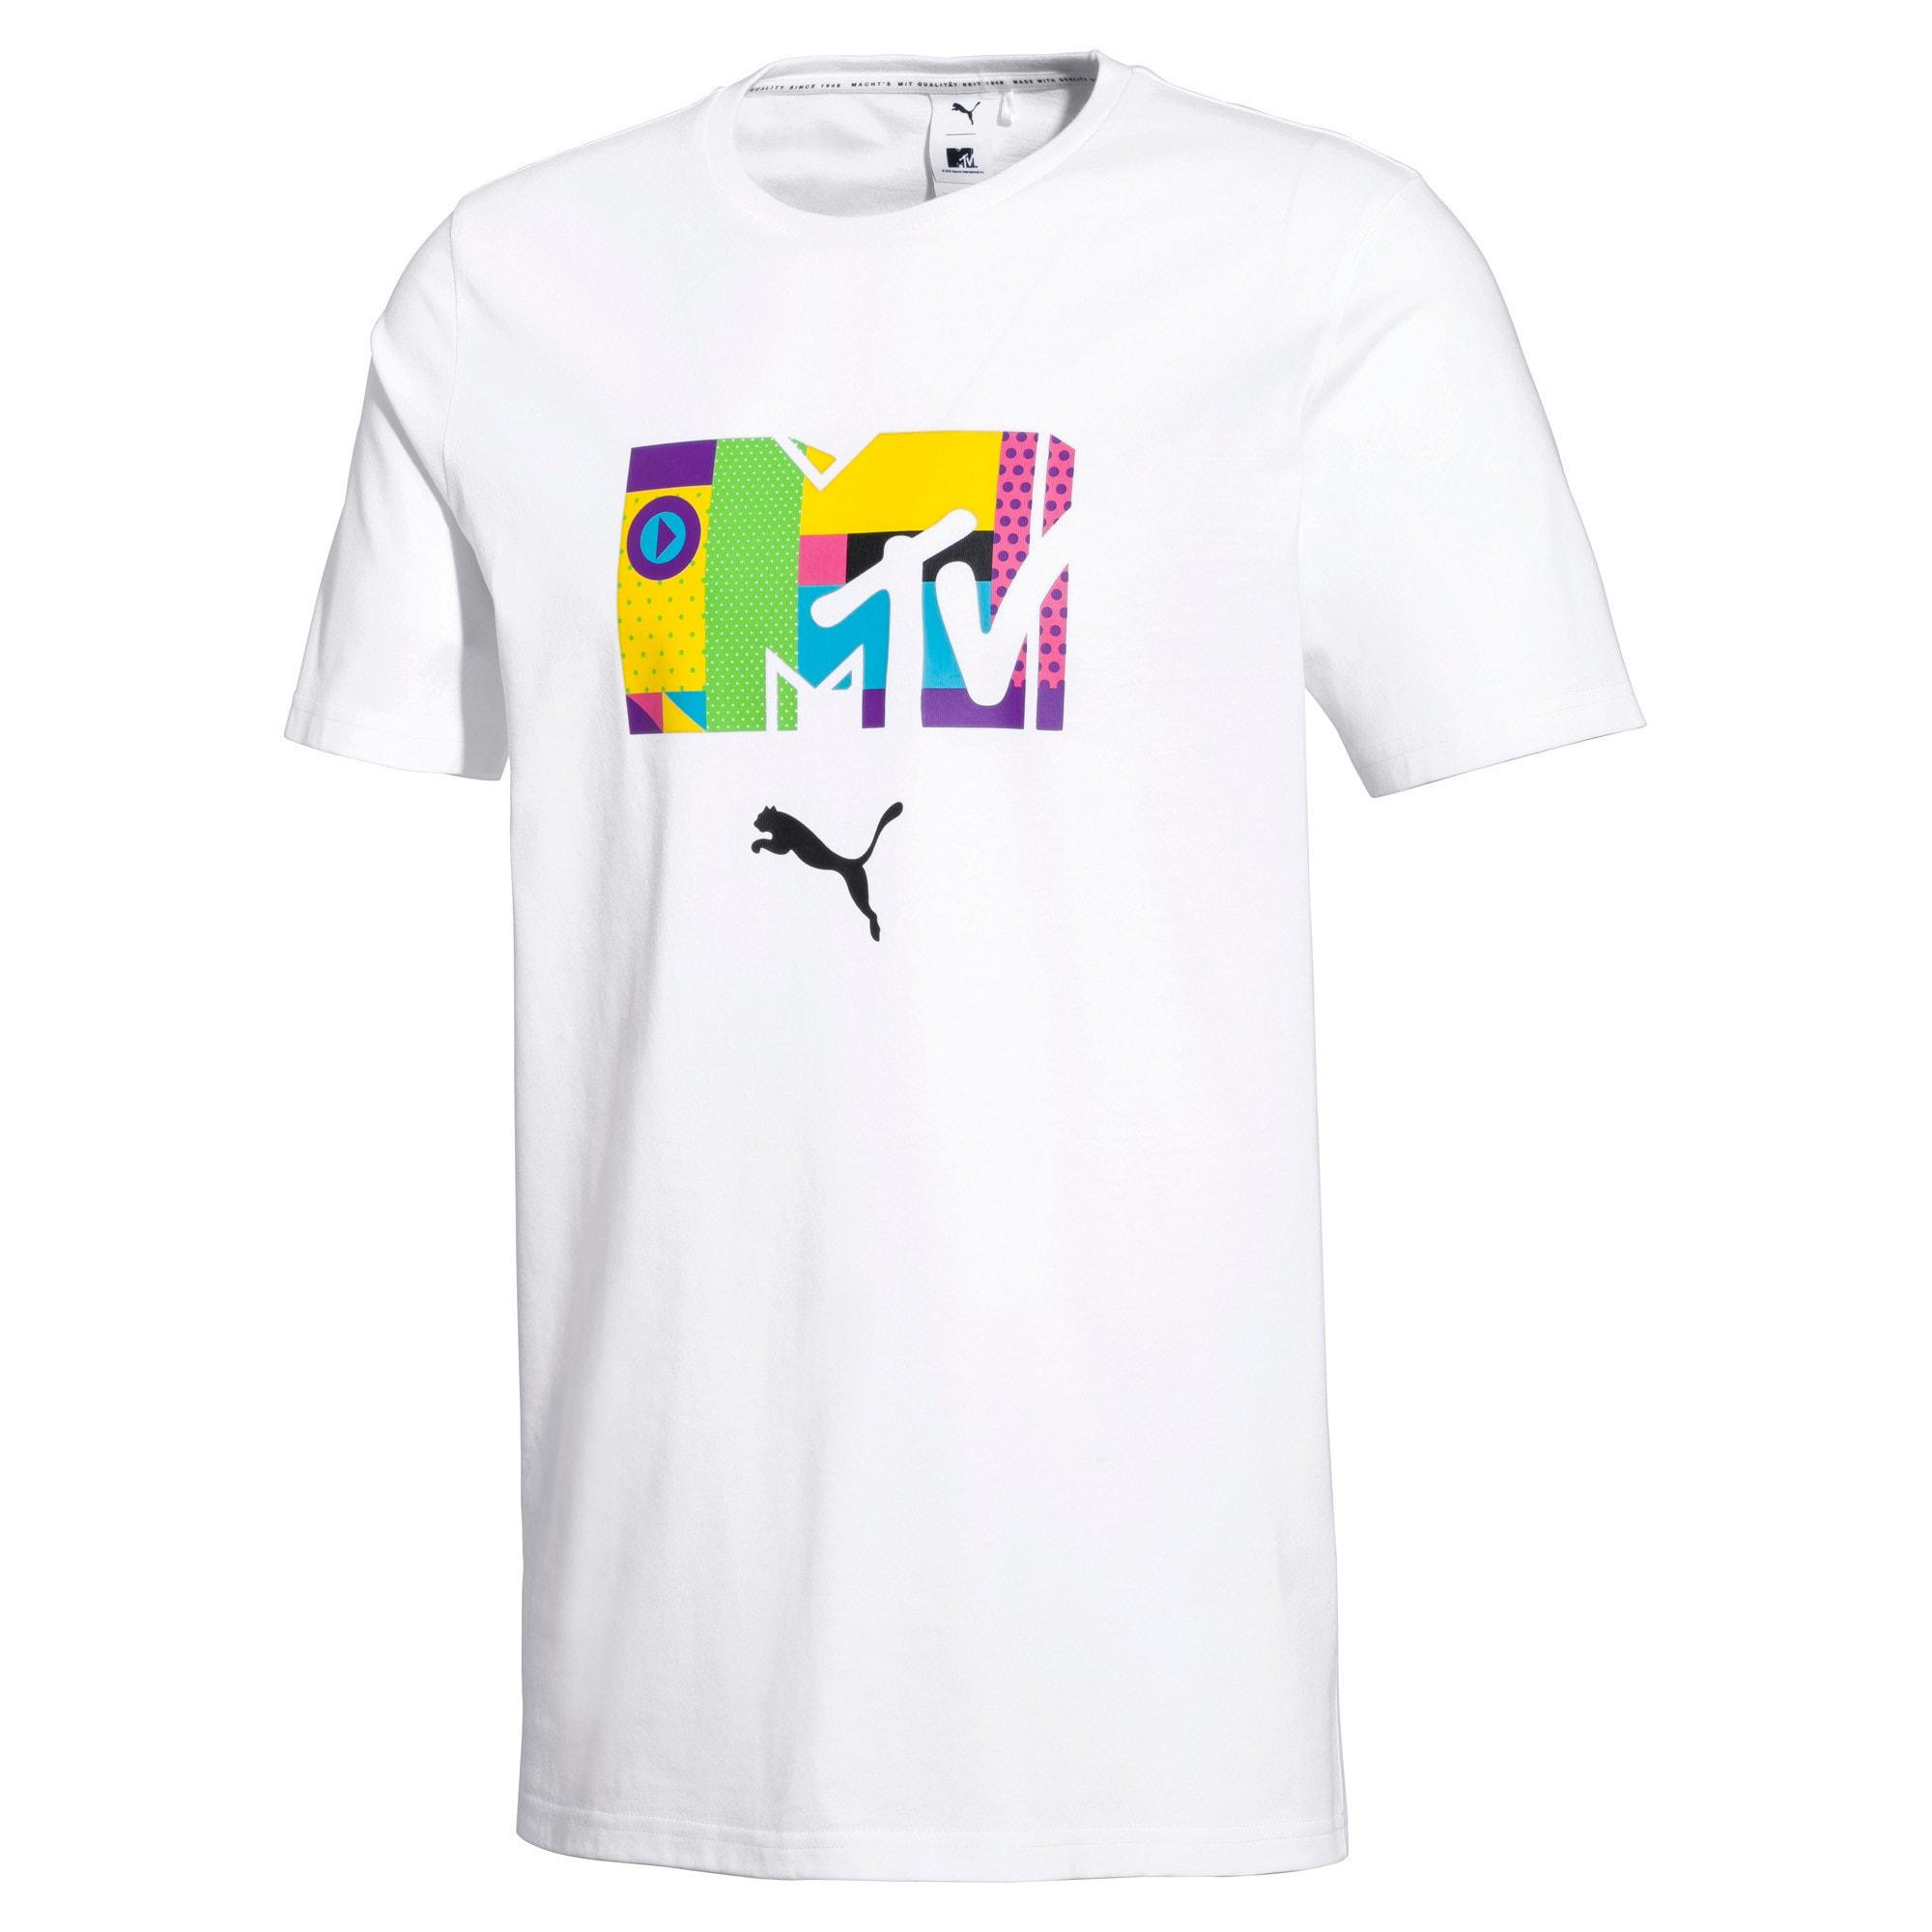 Thumbnail 4 of PUMA x MTV Men's Tee, Puma White, medium-IND